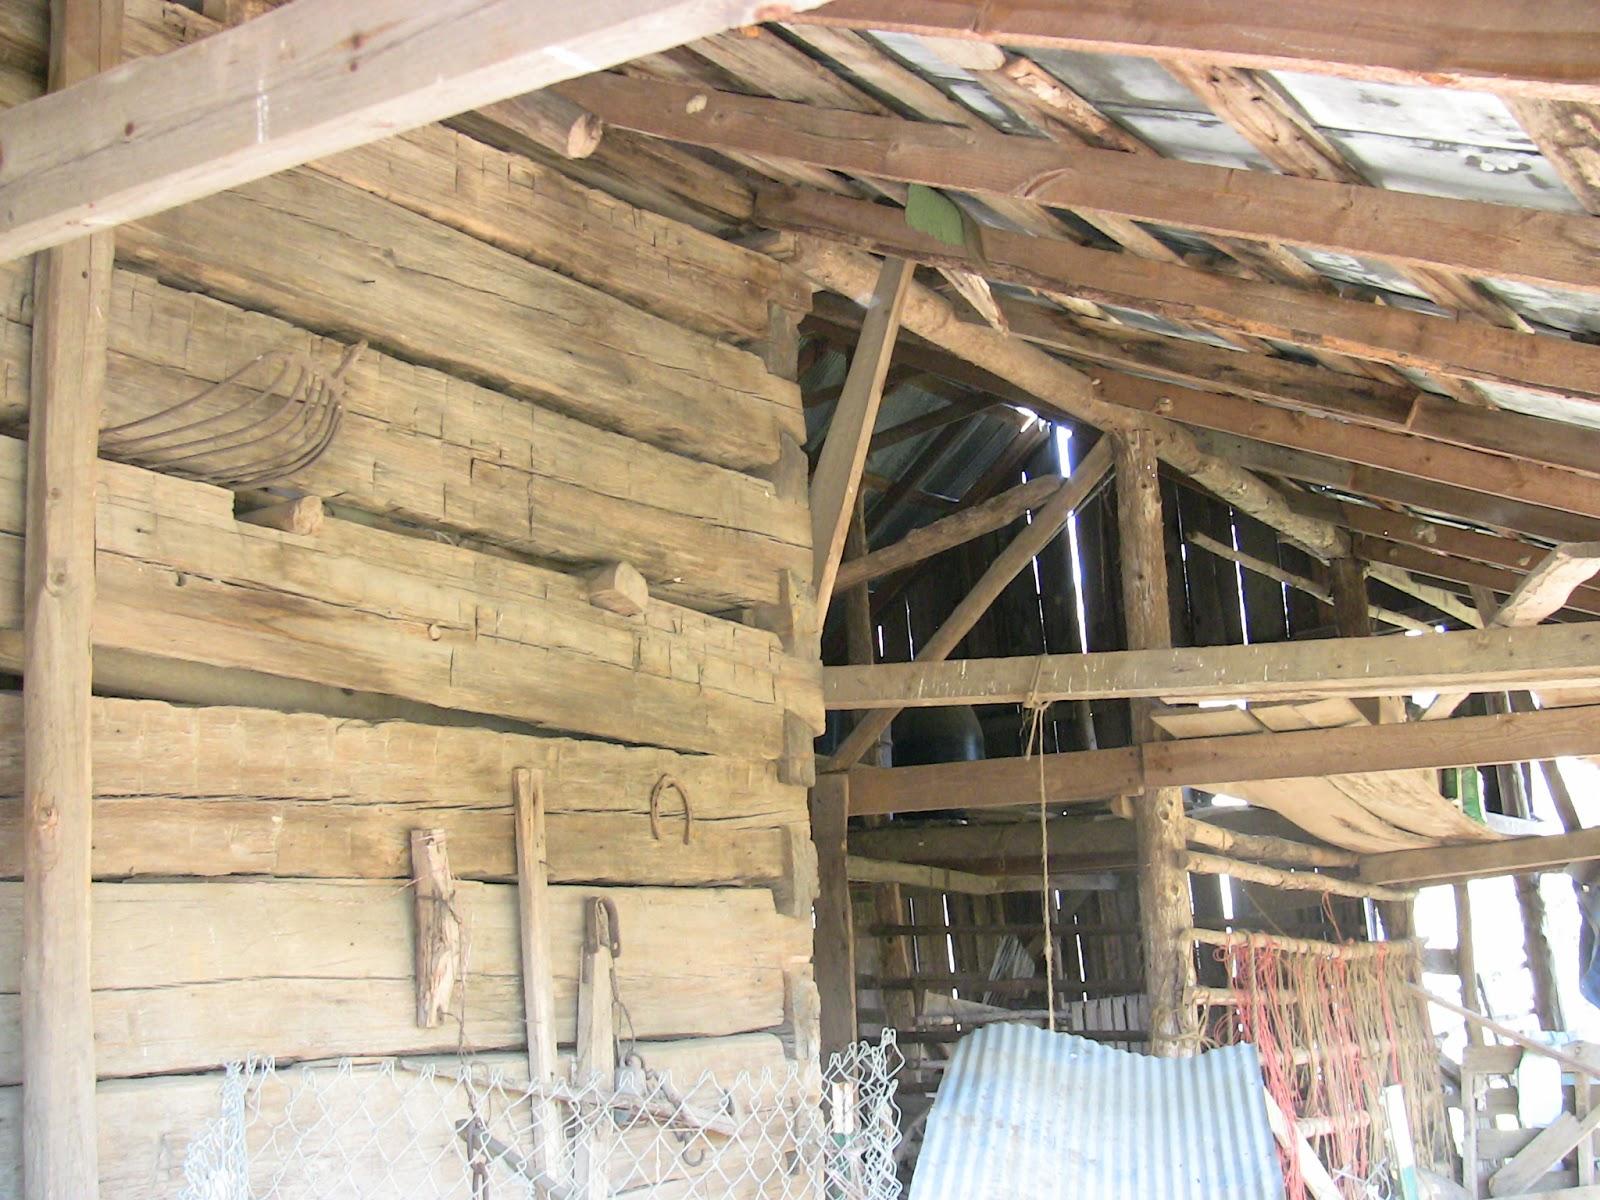 Aufi Jeep >> Exploring Izard County: W. B. Byler Barn